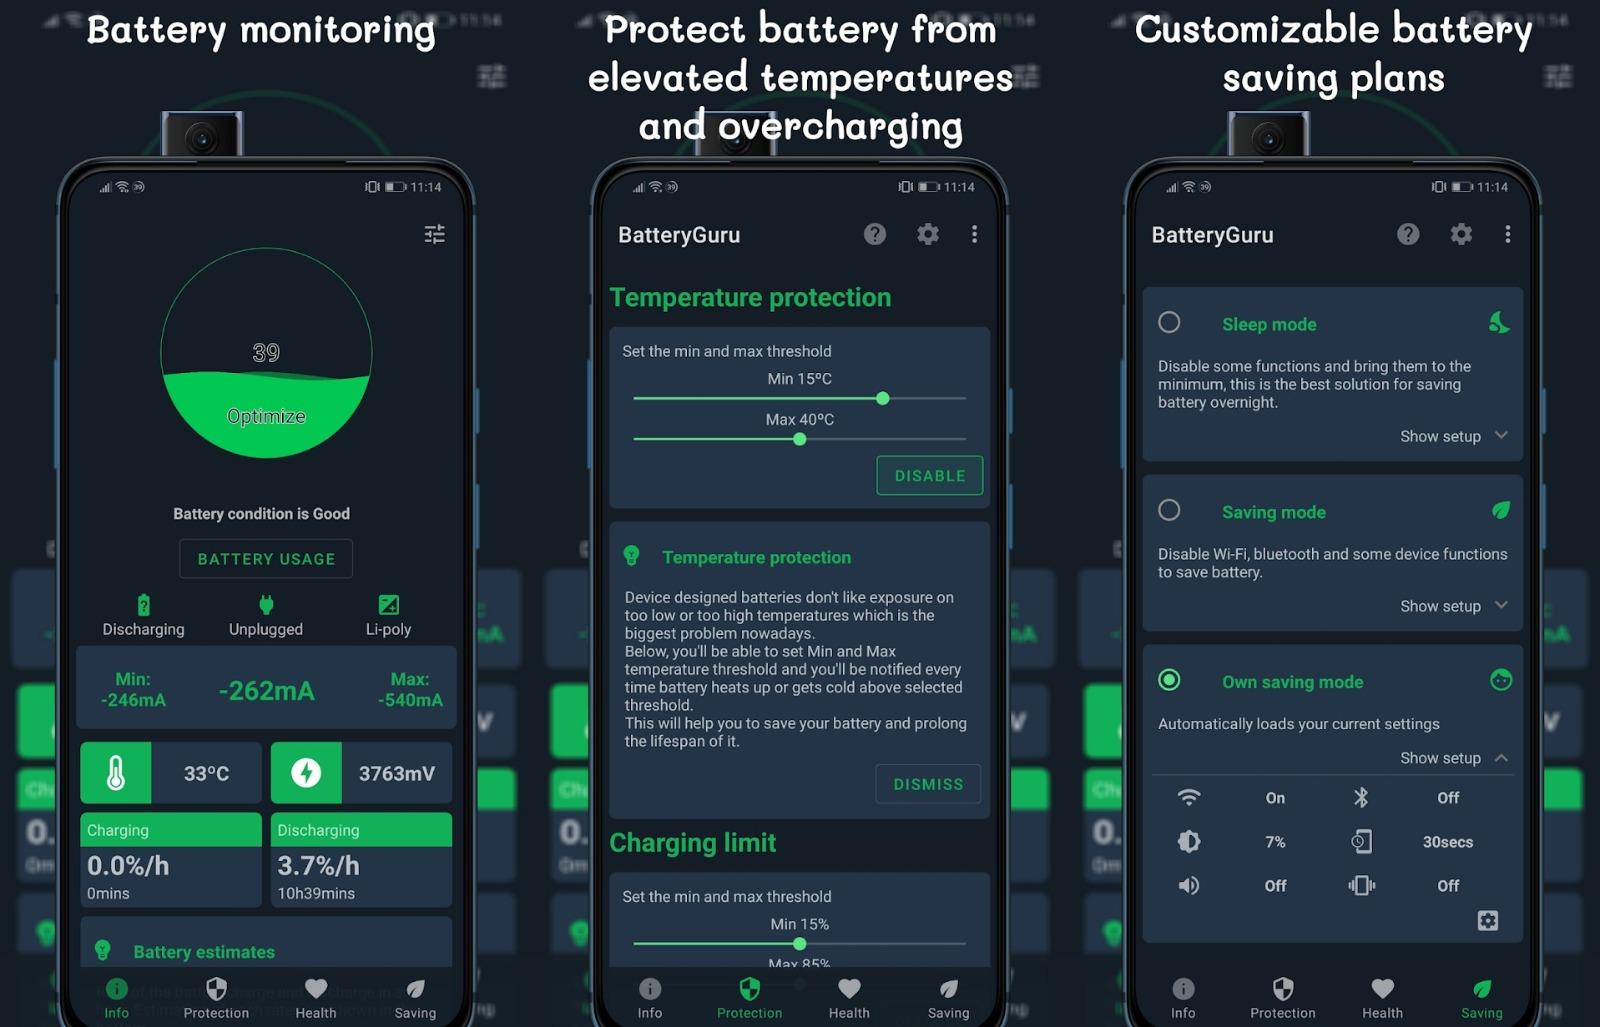 BatteryGuru Android App